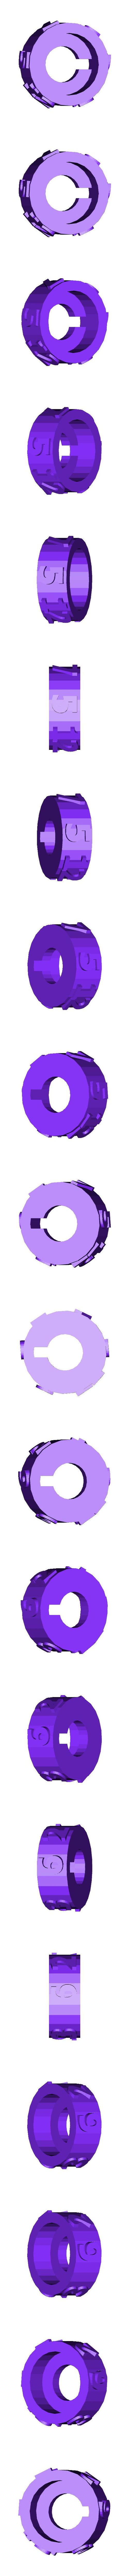 Wheel_2_separate.stl Download free STL file Series Puzzle • 3D printer model, Balkhnarb